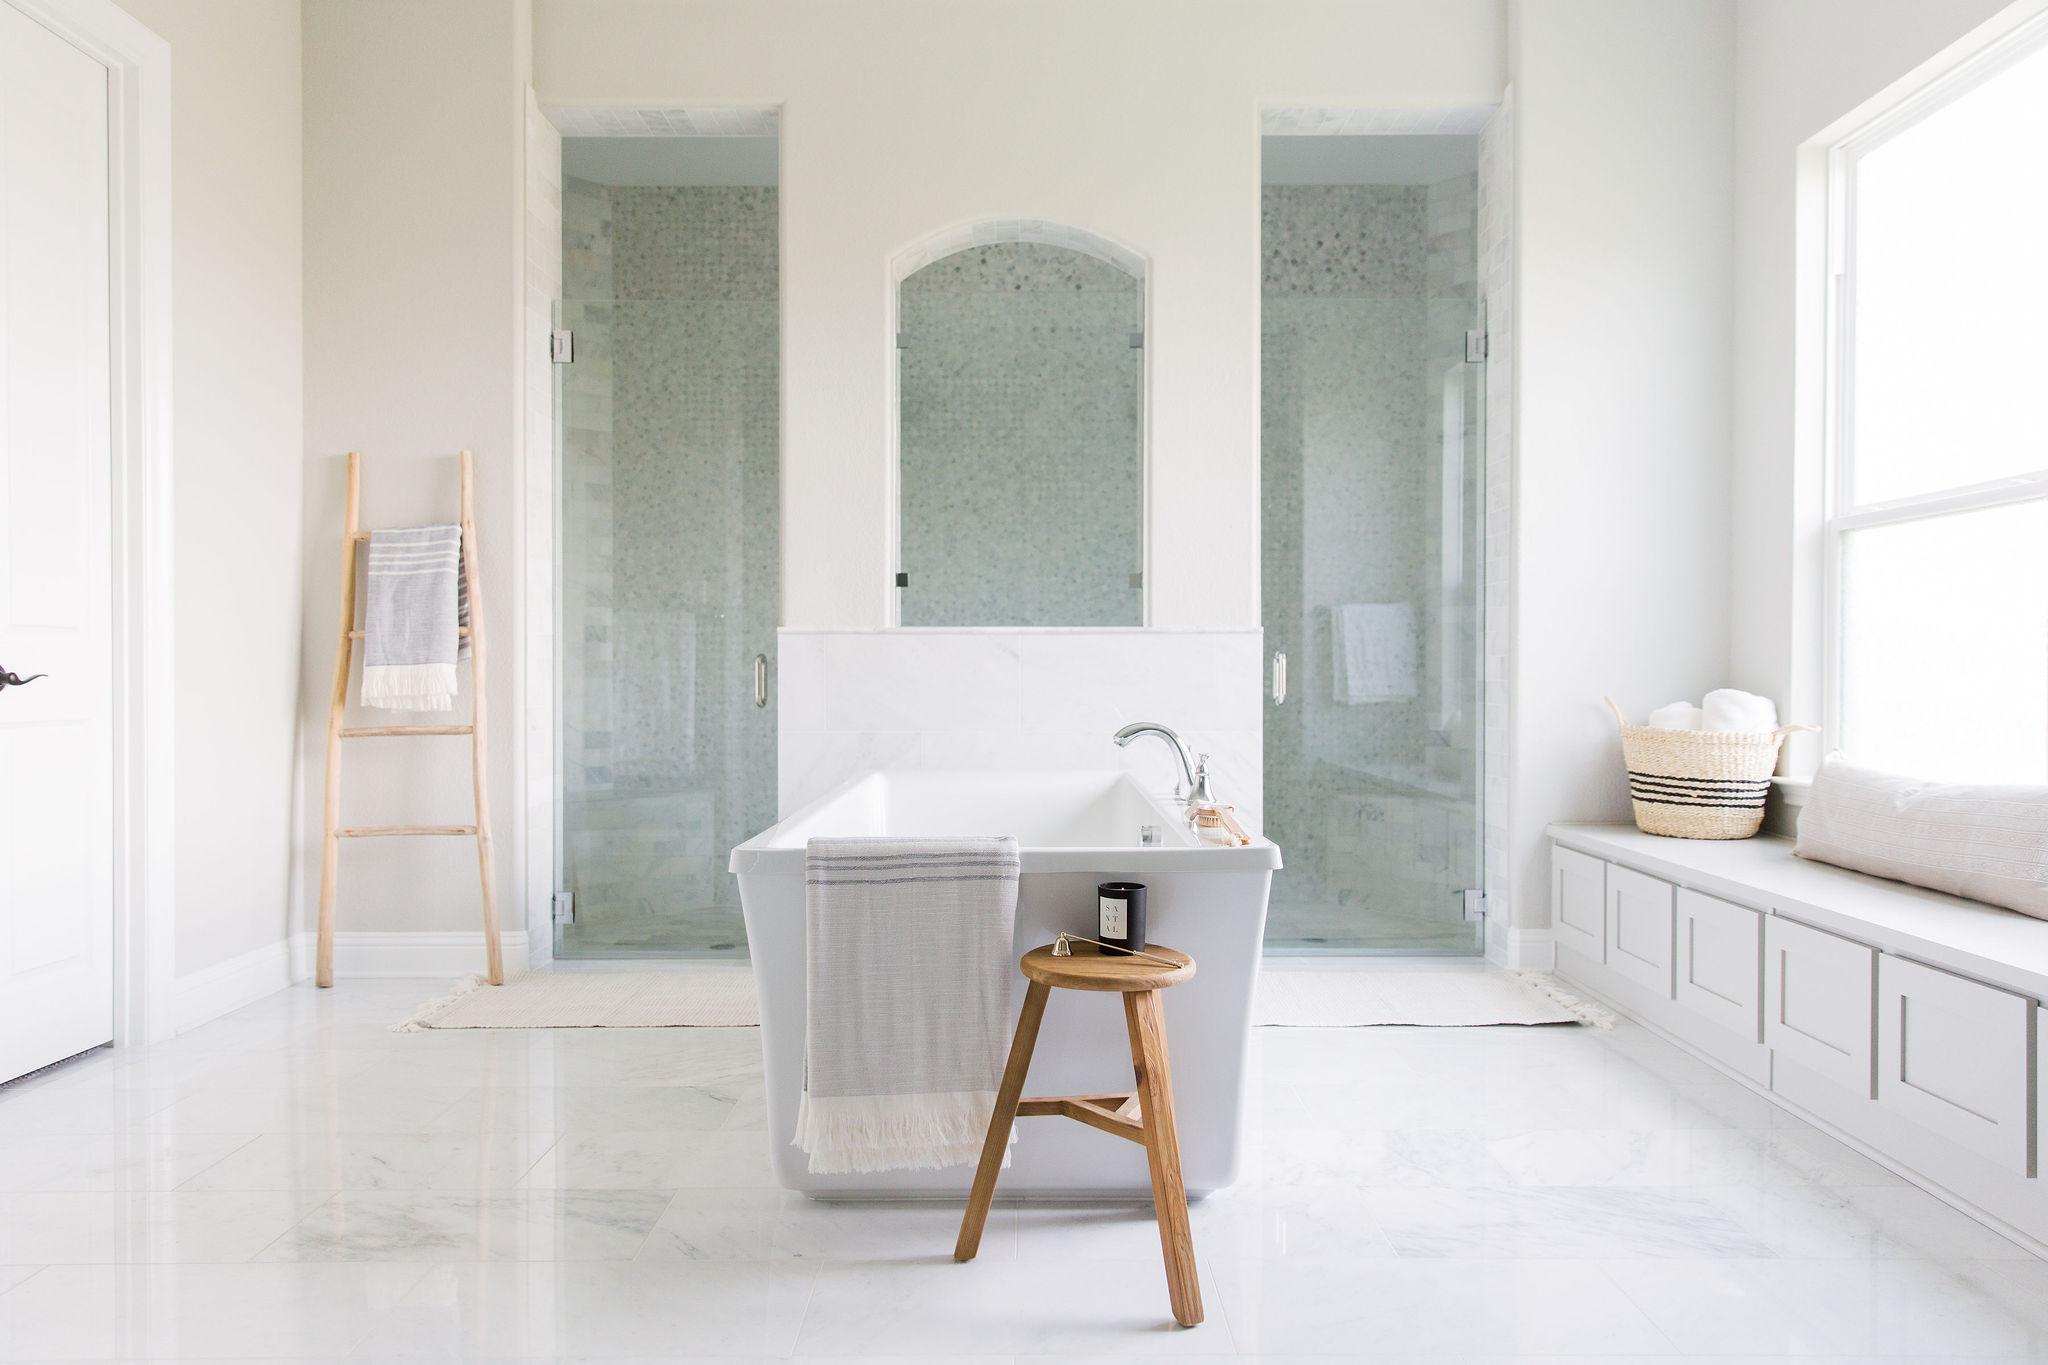 Bathroom design using marble tiles, wood